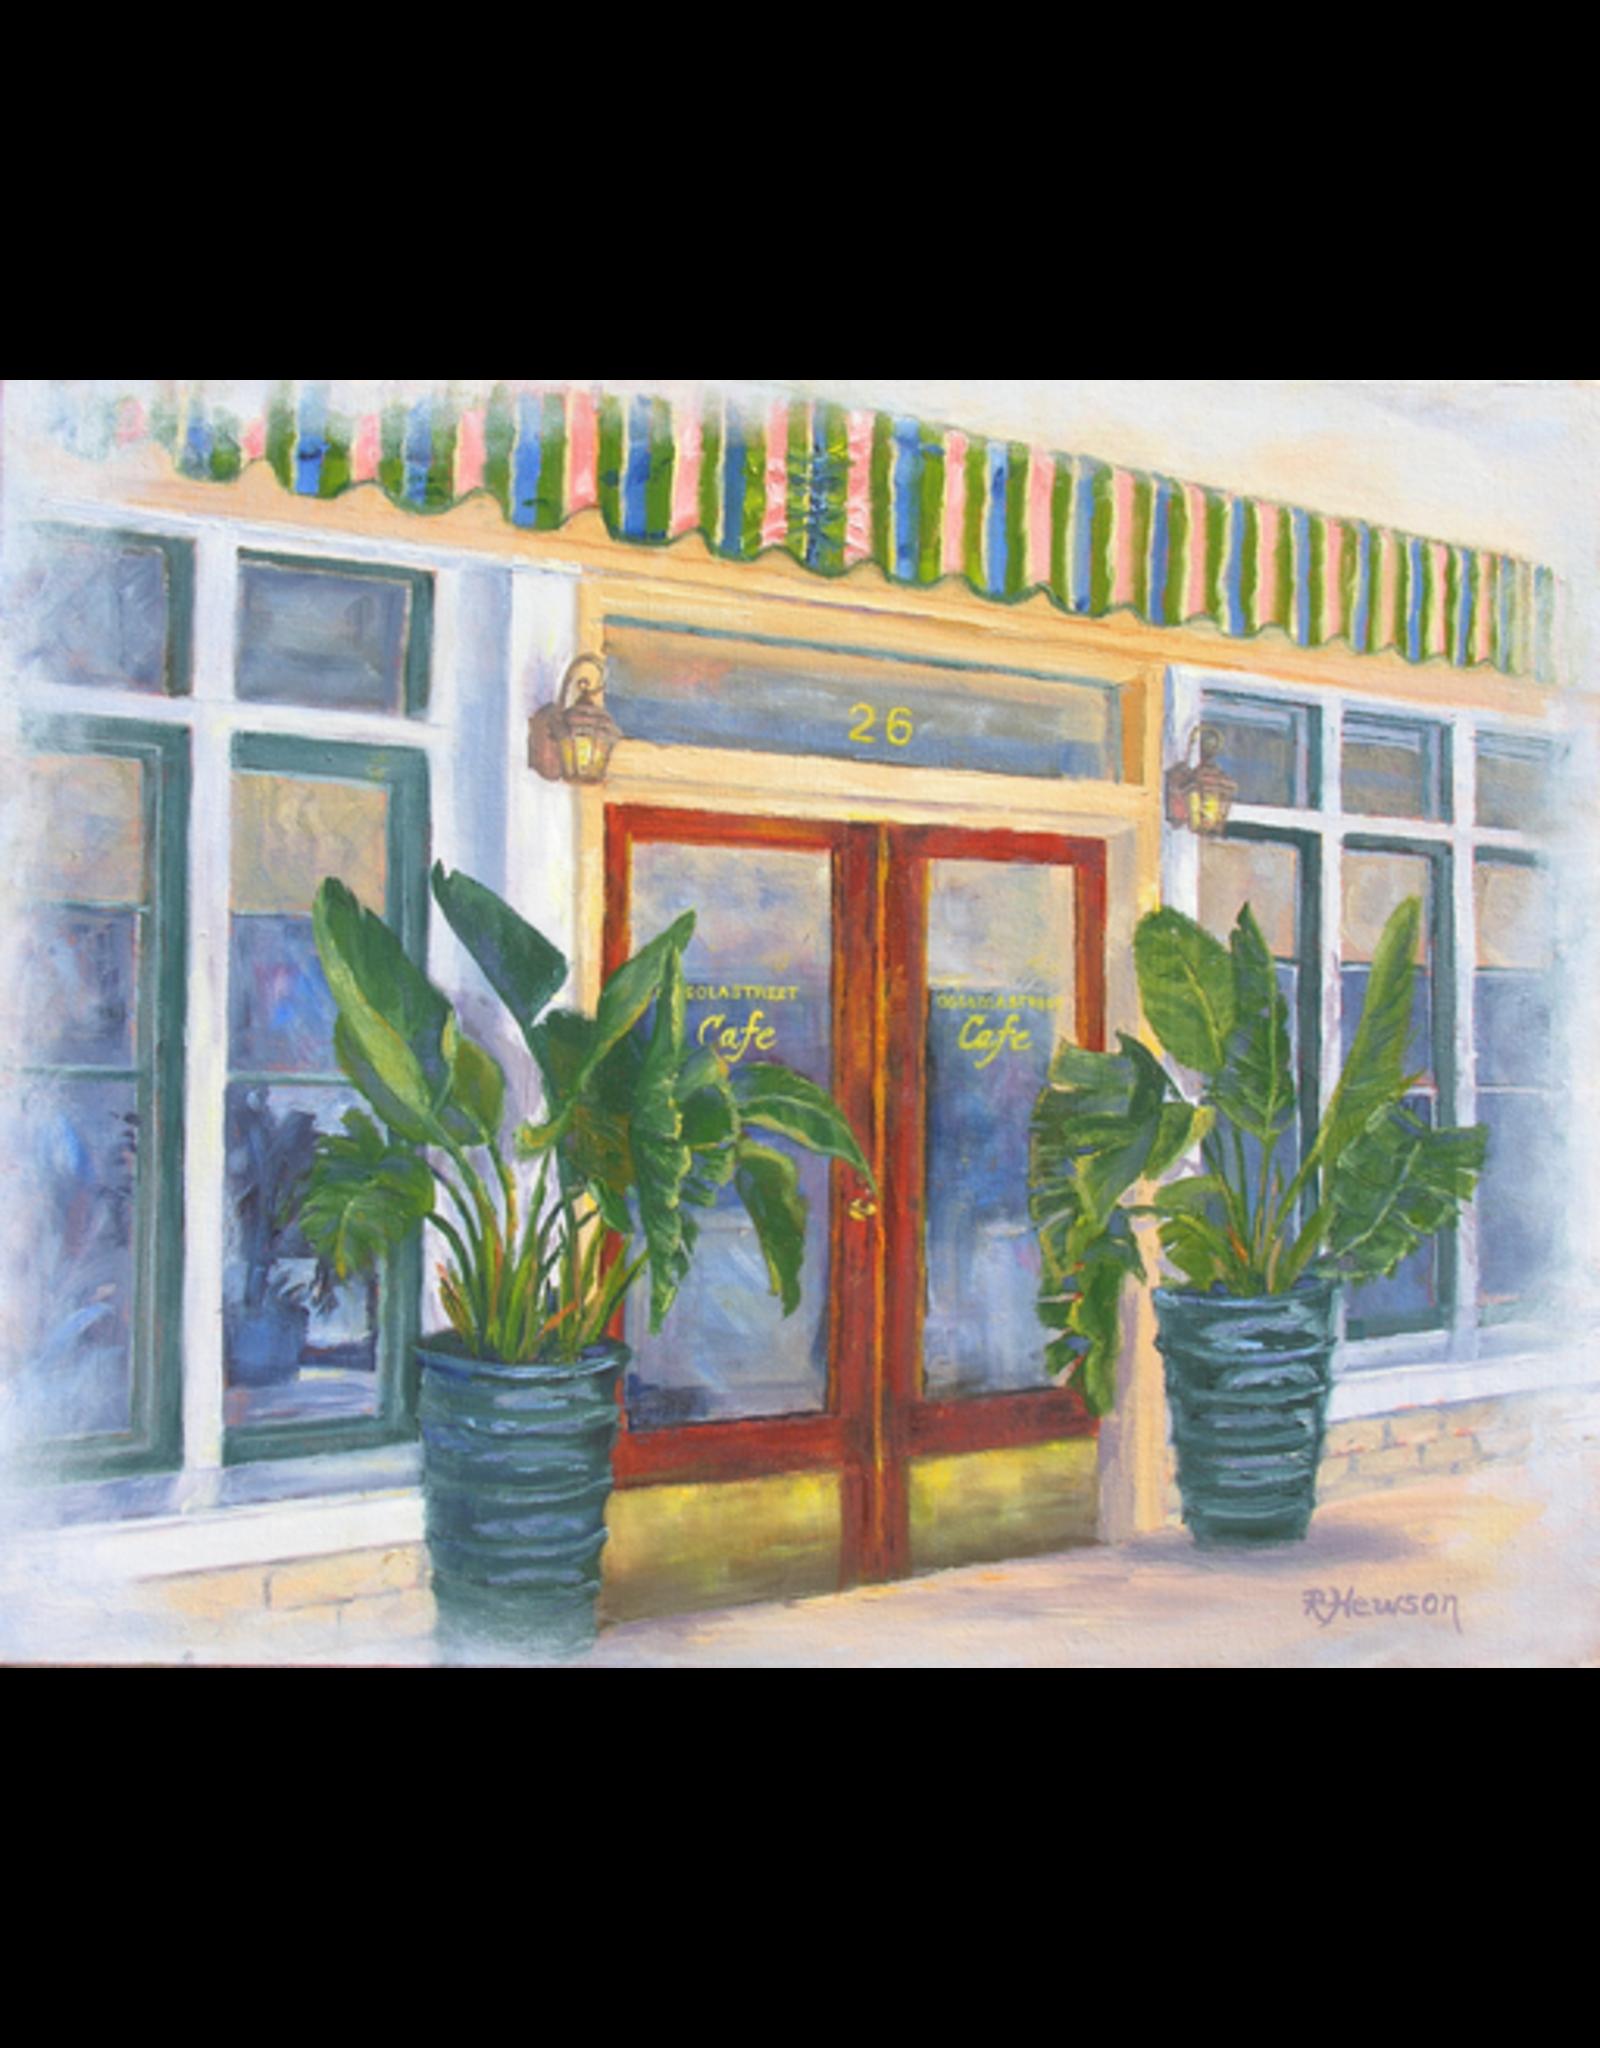 Ruthann Hewson Osceola St. Cafe (Print, Matted, 11x14)